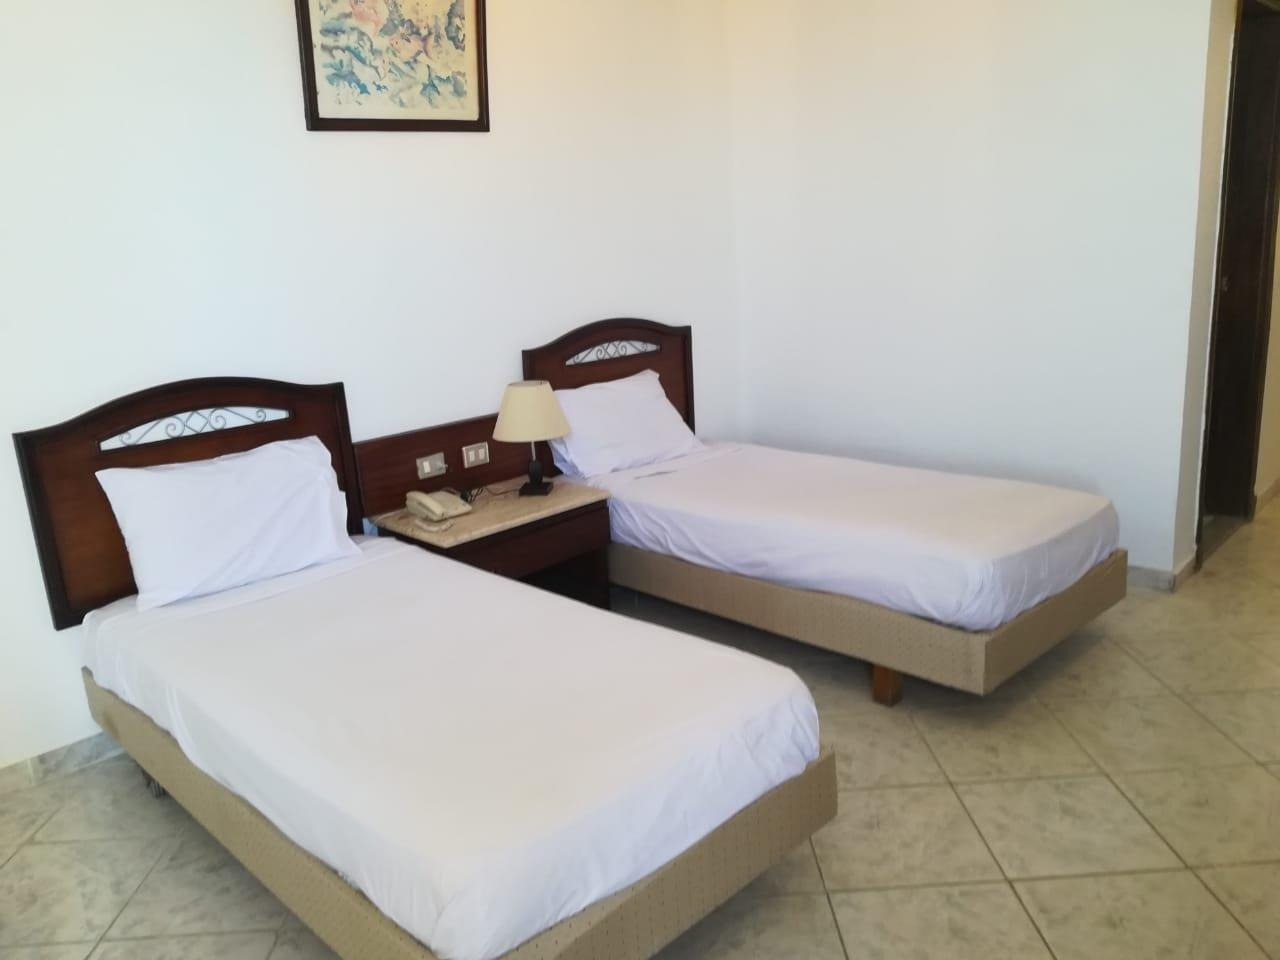 roma-host-way-hotel-aqua-park-genel-009